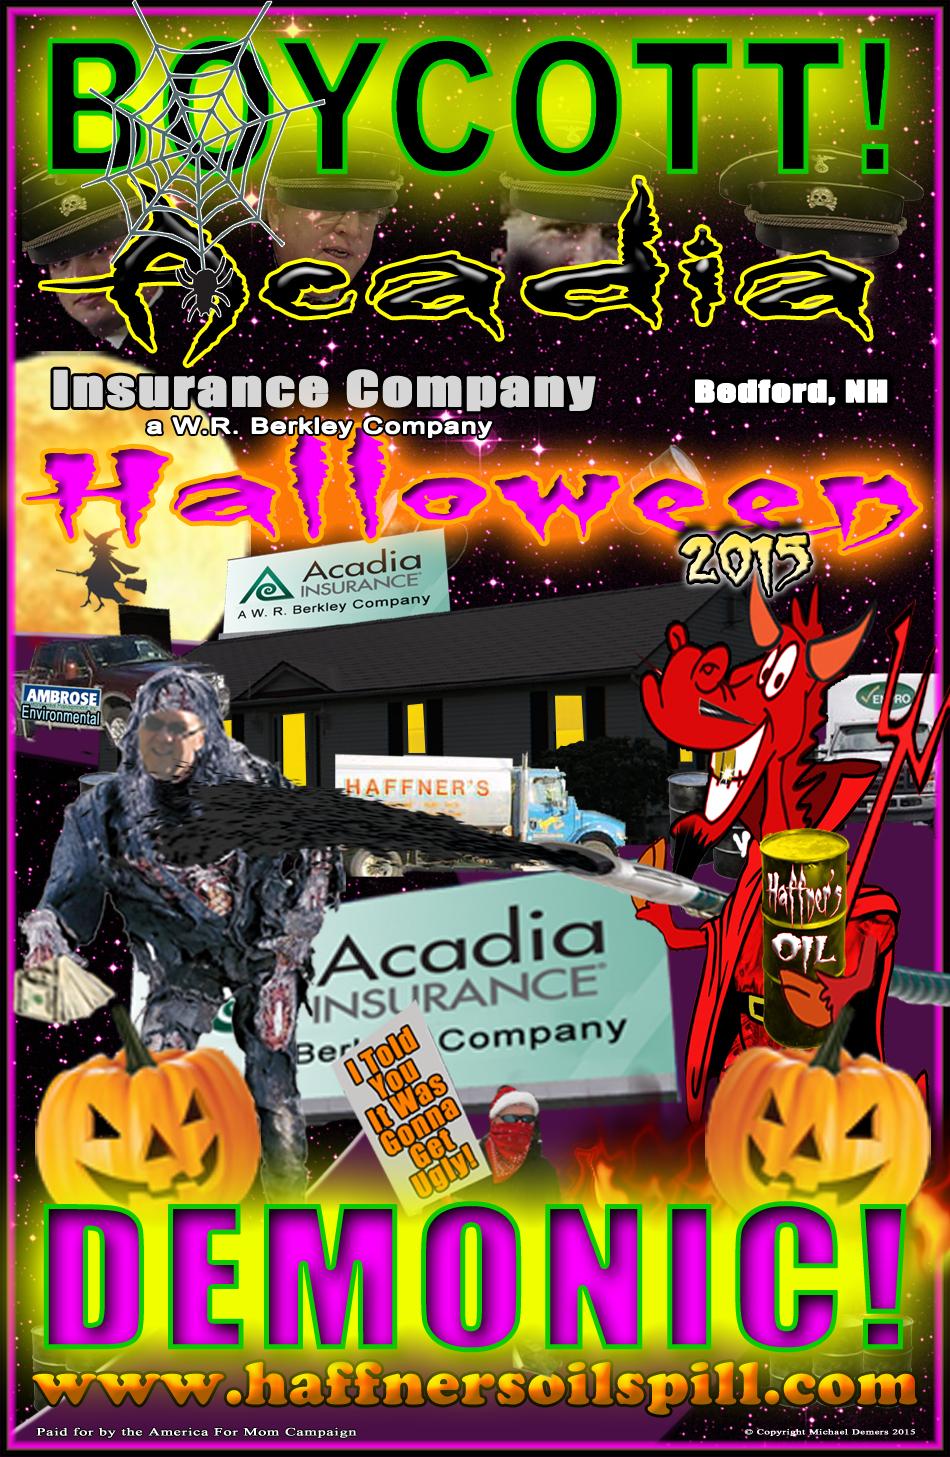 HalloweenAcadia